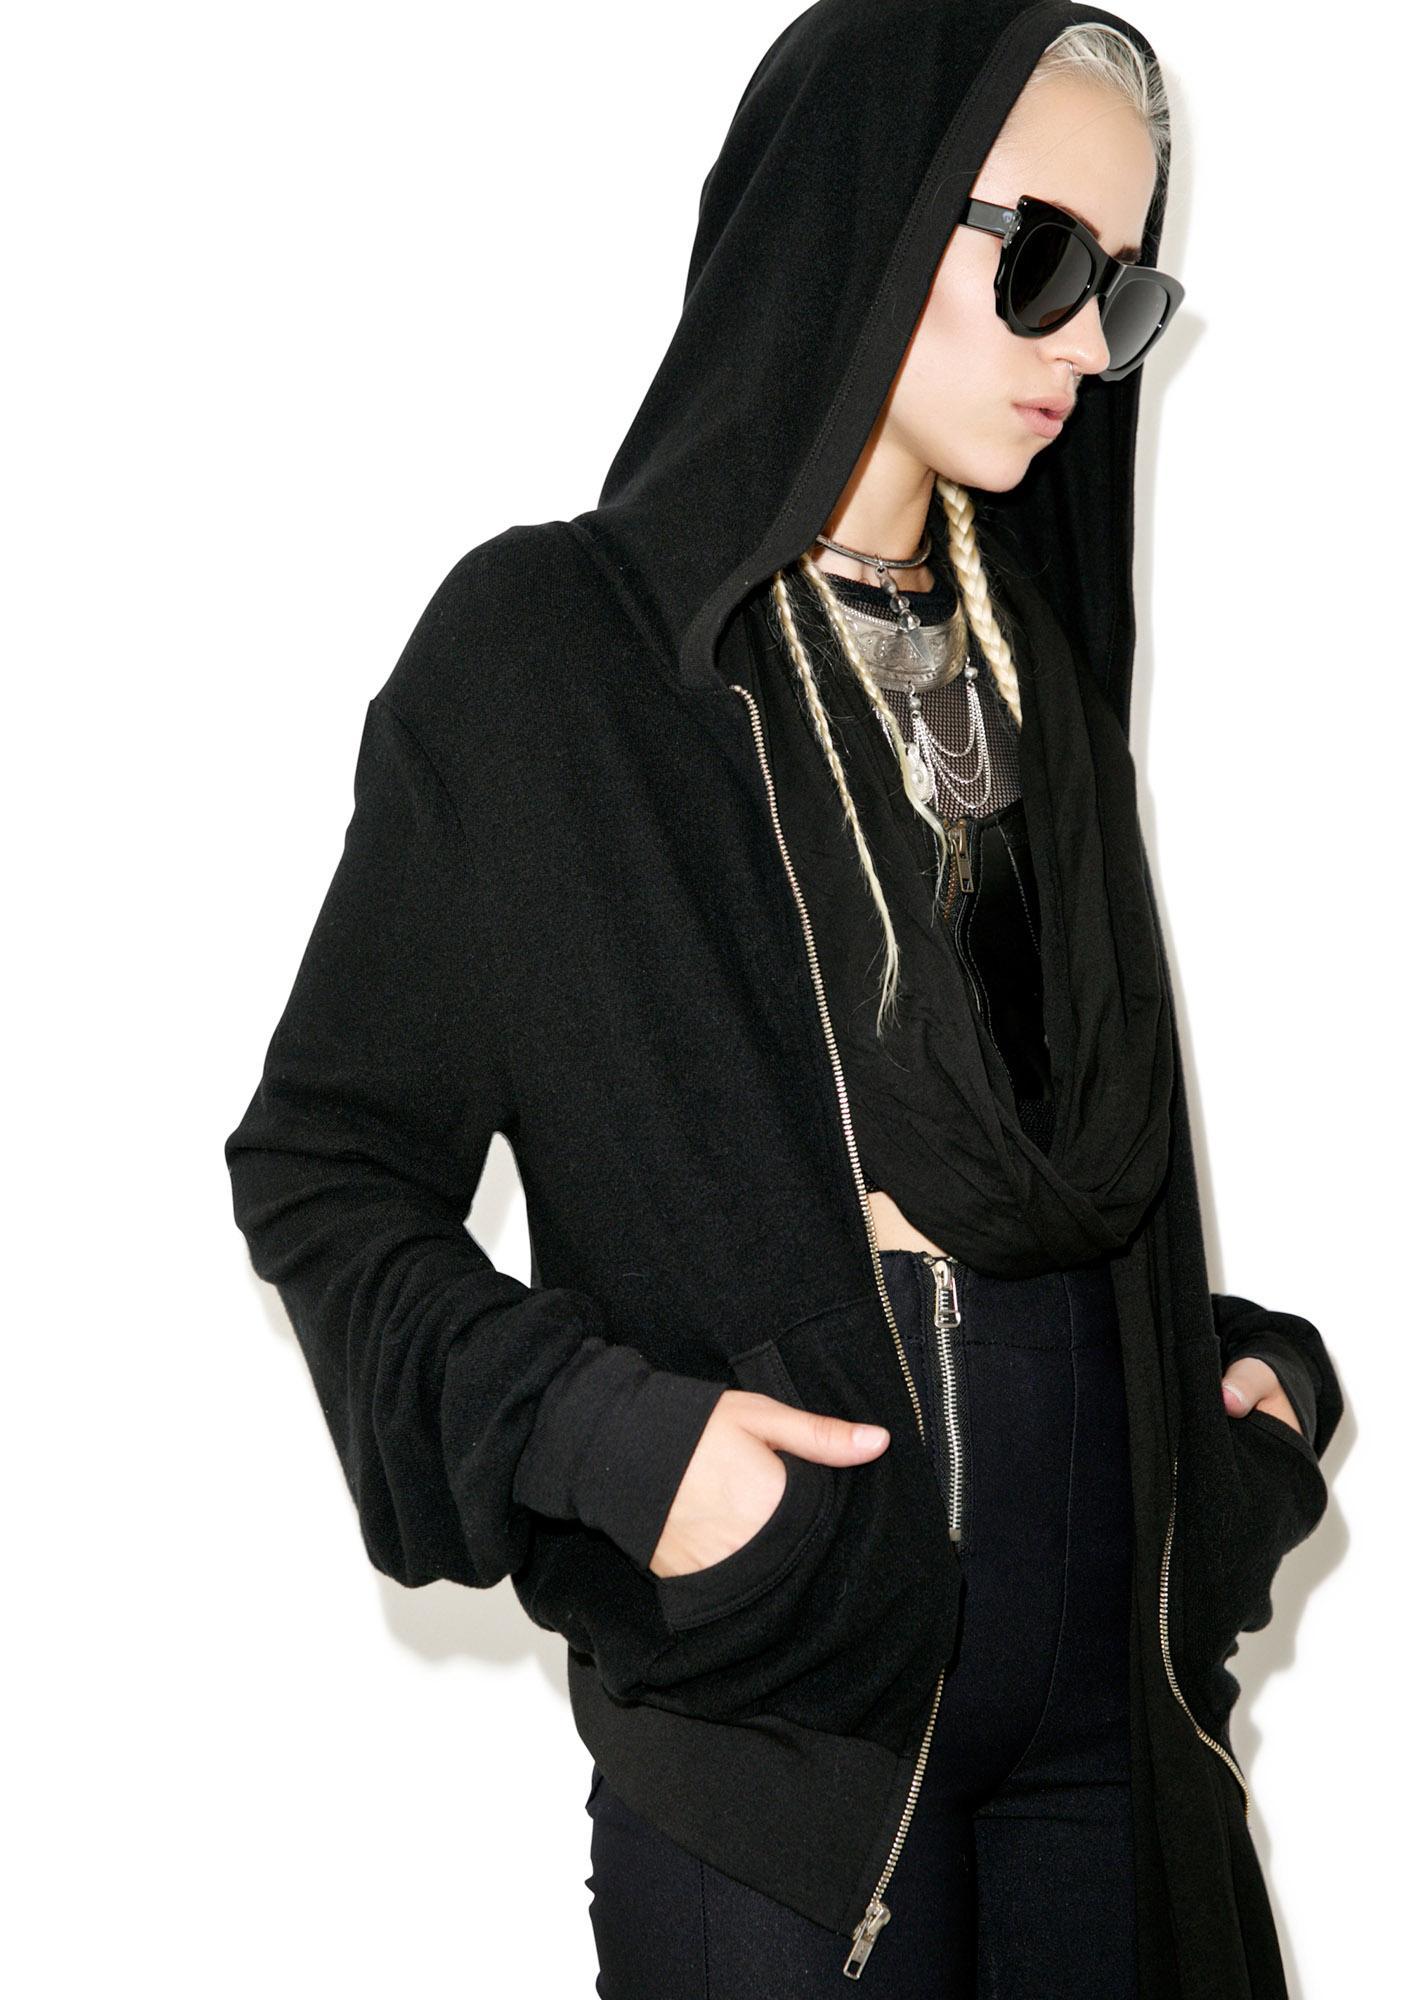 Wildfox Couture Coven Girl Malibu Zip Up Sweatshirt